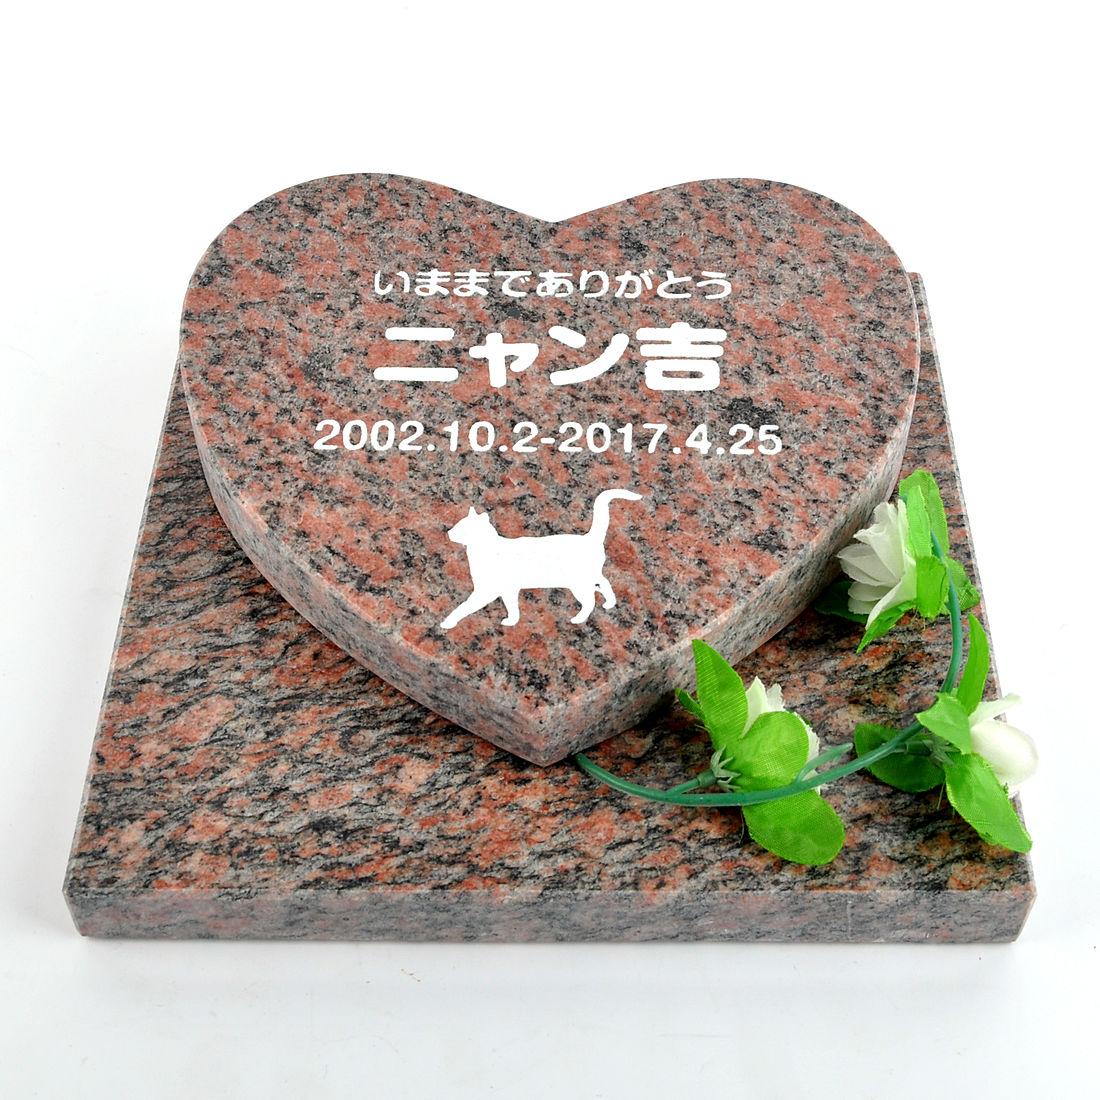 Pet&Love. ペットのお墓 天然石製 セット型 御影石 レッド ハート  【HLS_DU】【楽ギフ_名入れ】 attr131attr ctgr2ctgr sml3sml+ctgr2ctgr CAT